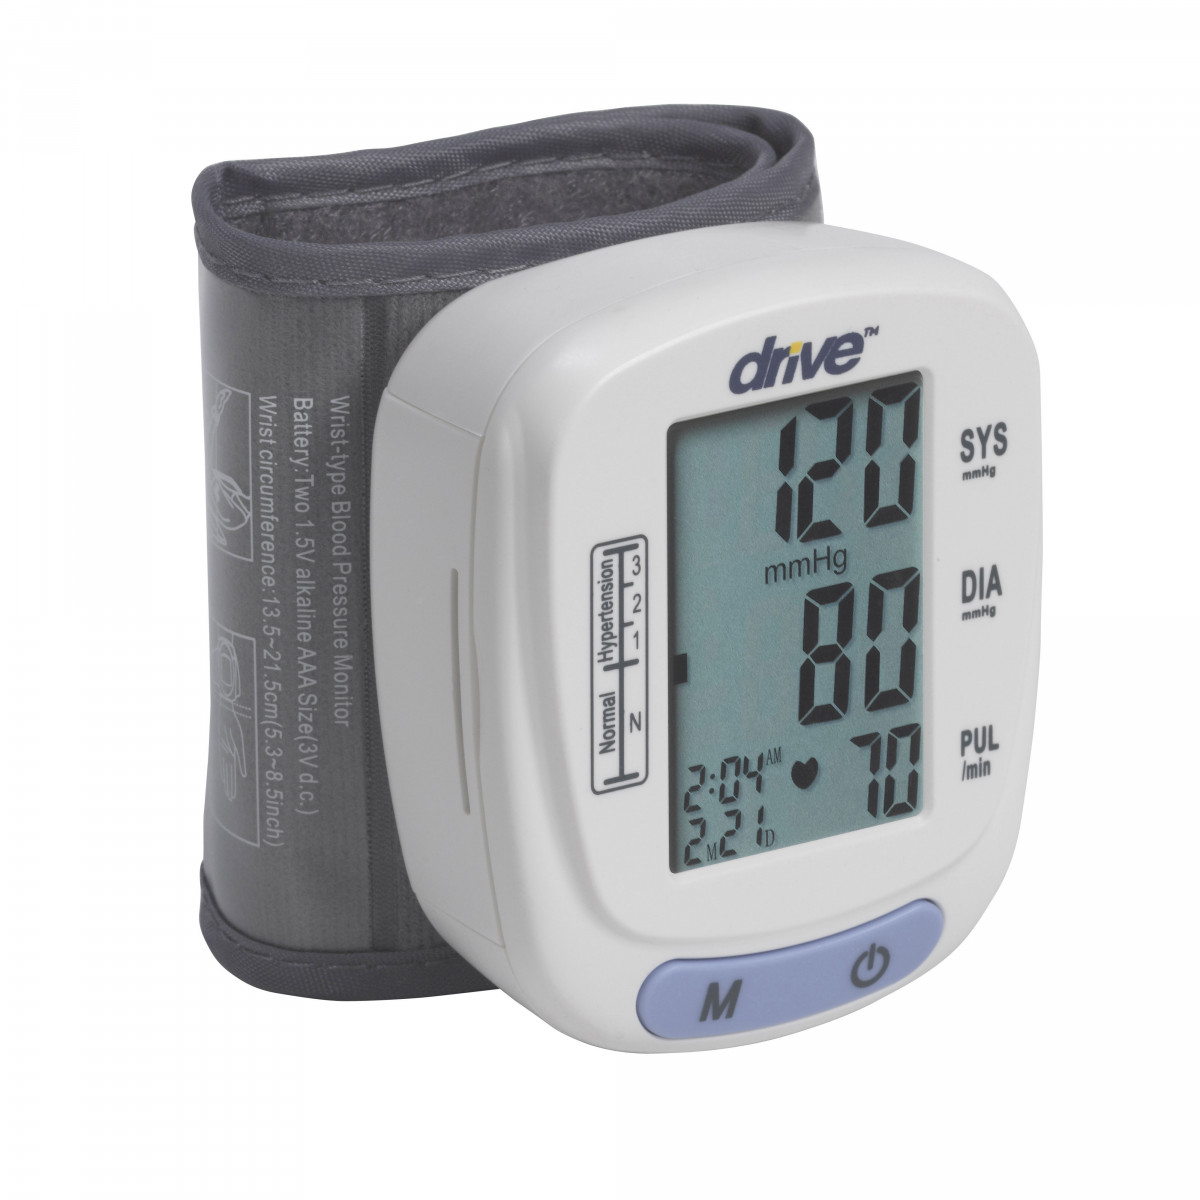 automatic blood pressure monitor wrist model 1b1